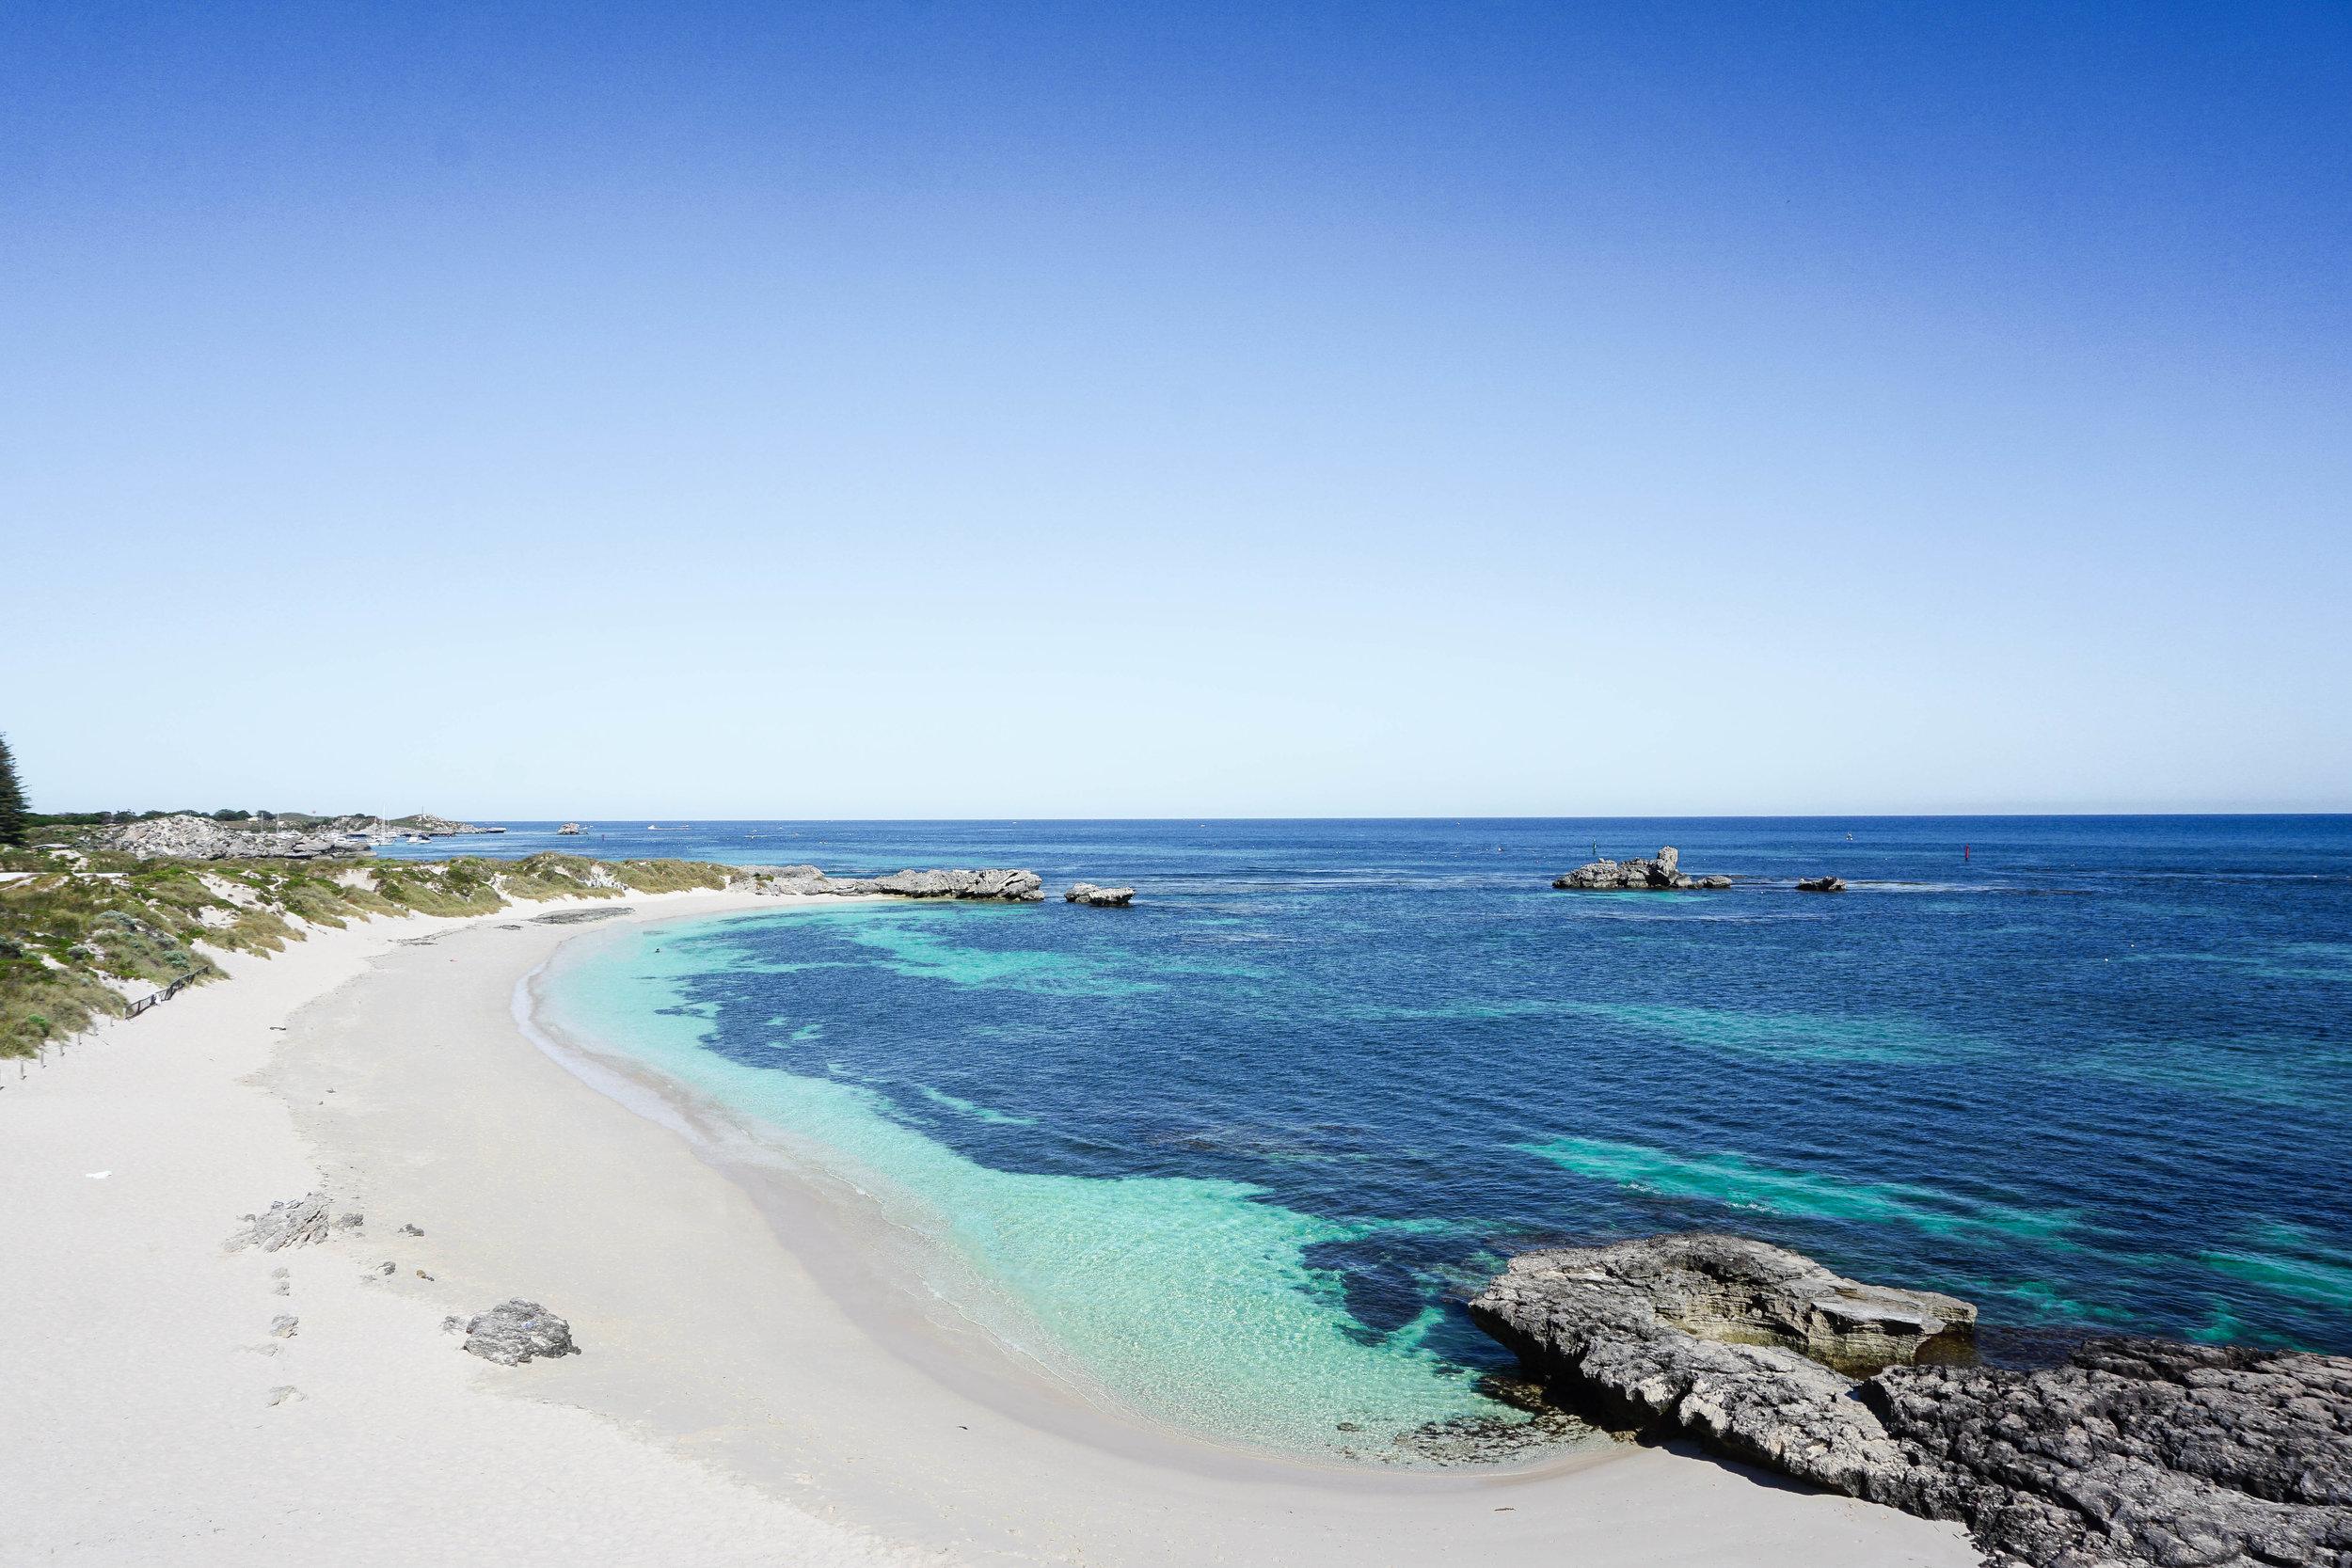 Rottnest Island - Pinky Beach